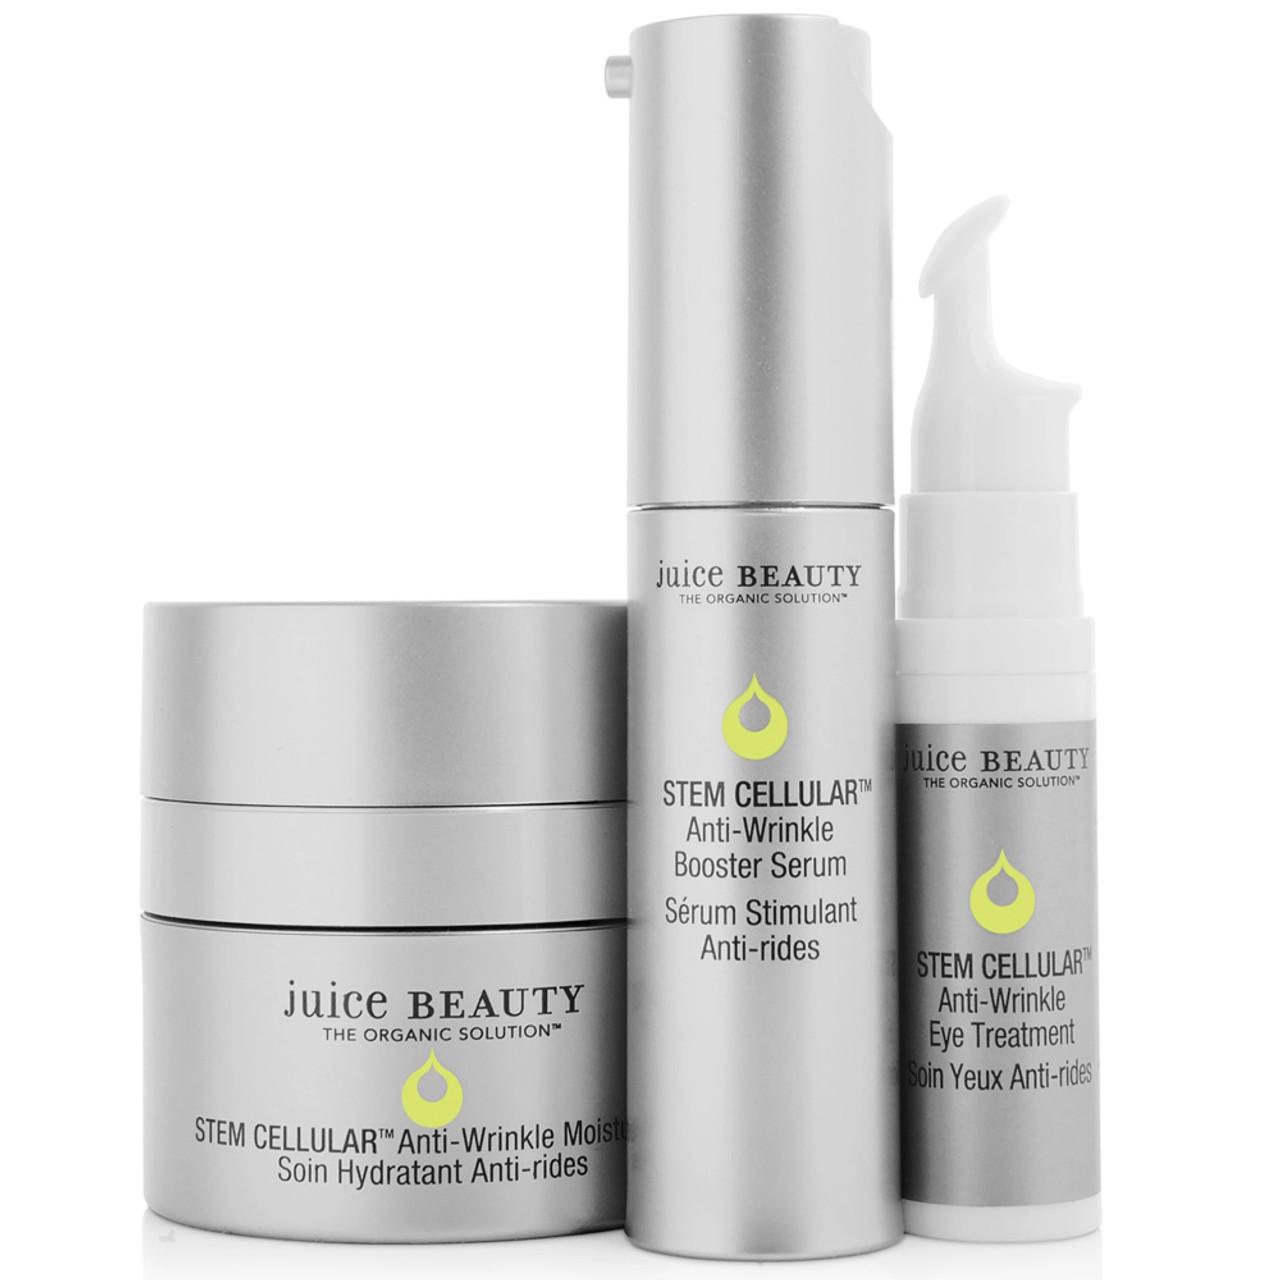 Juice Beauty Cellular Anti-Wrinkle Solutions Kit BeautifiedYou.com